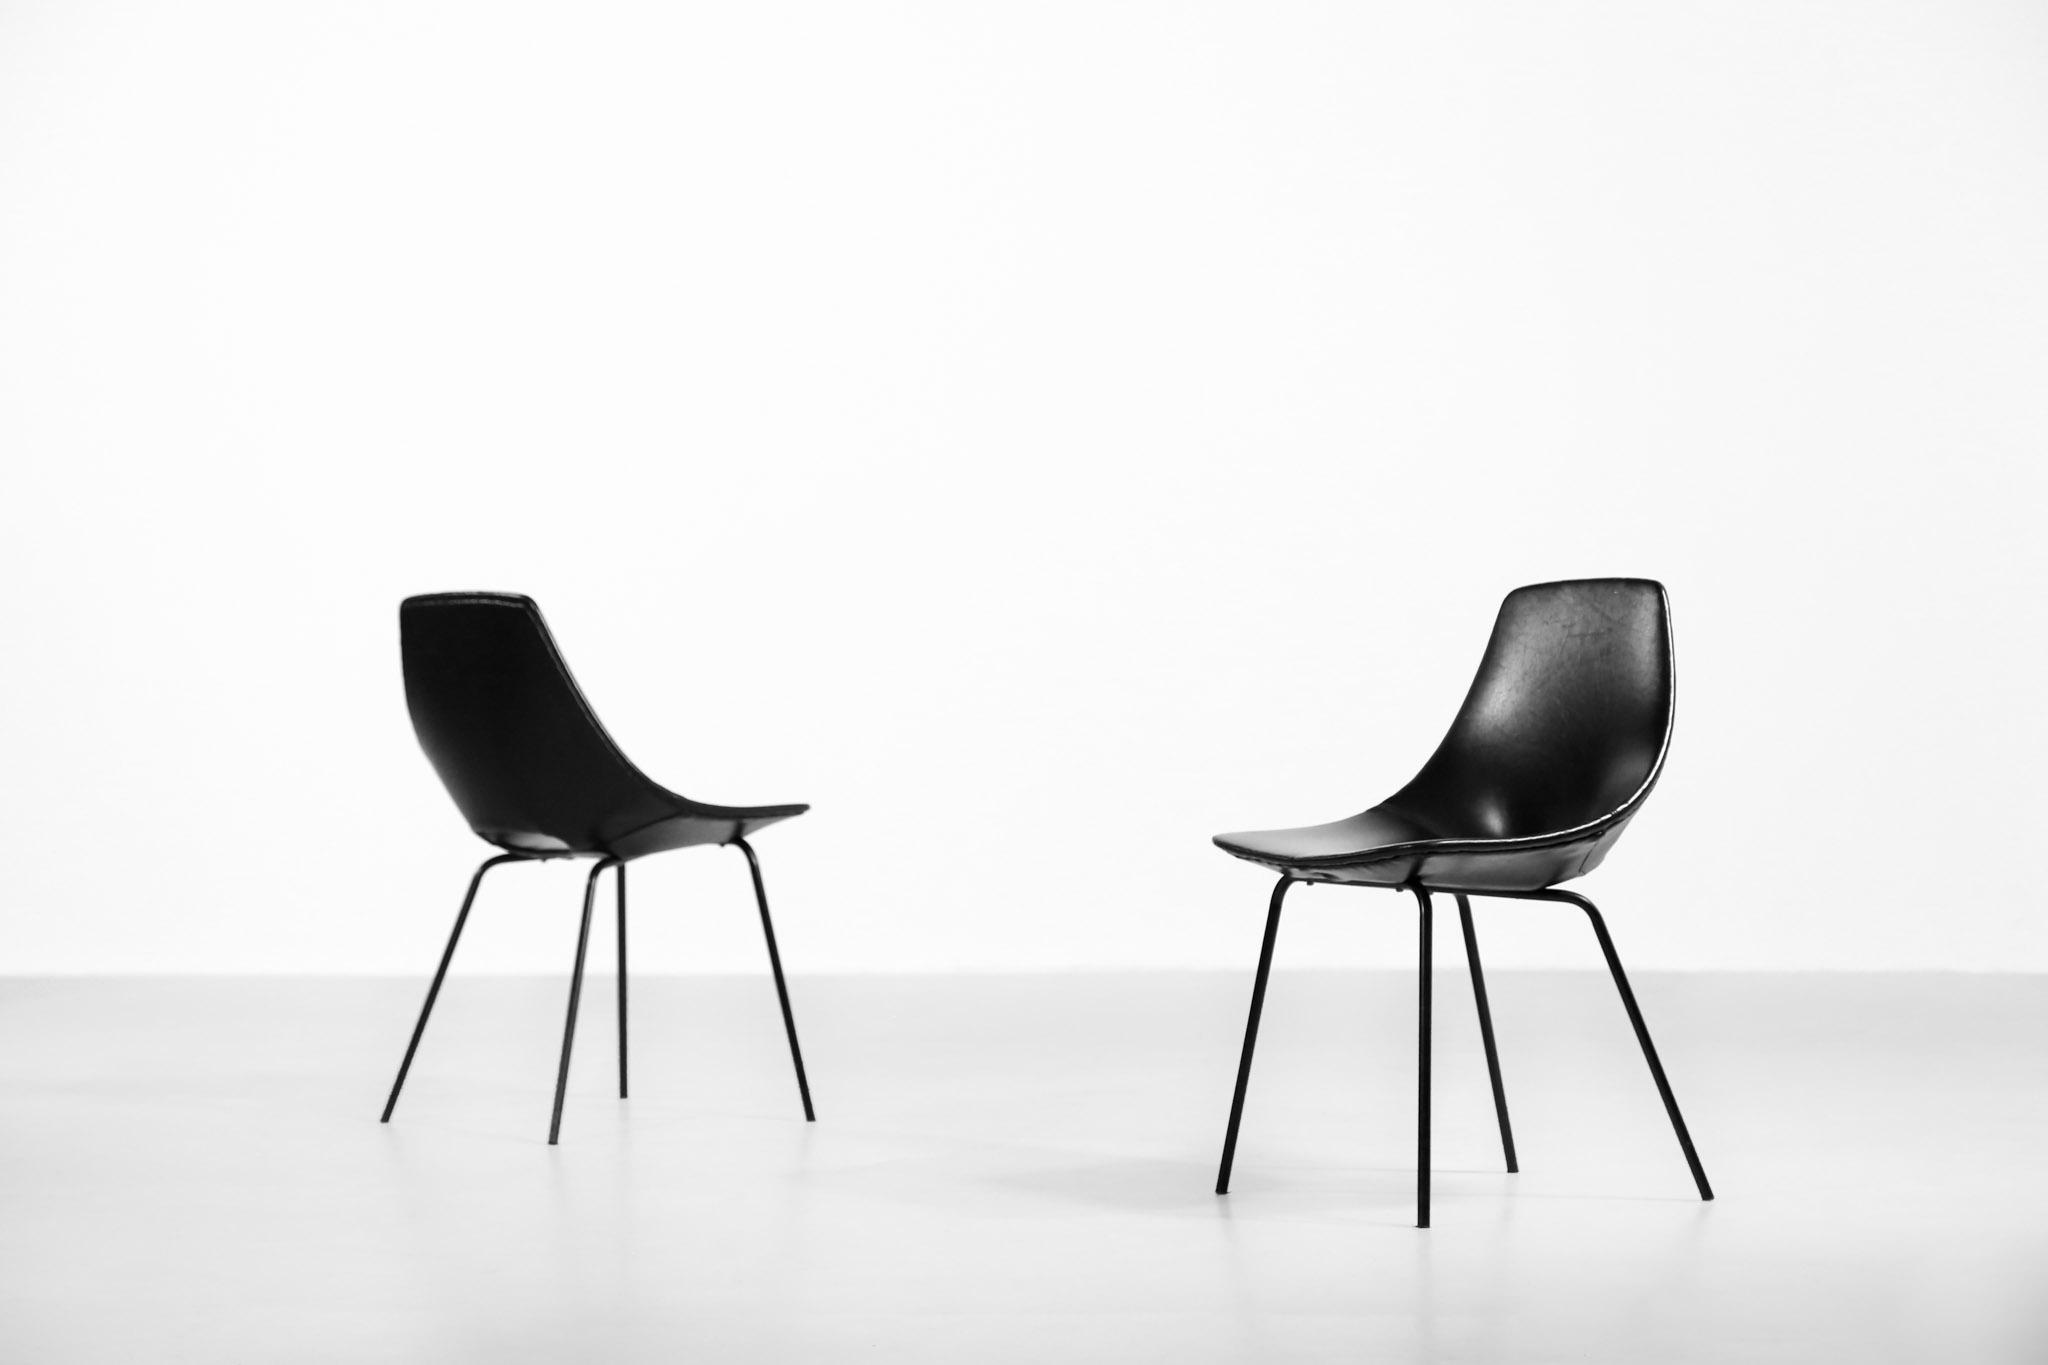 Tonneau Chairs By Pierre Guariche 16 Chairs Danke Galerie